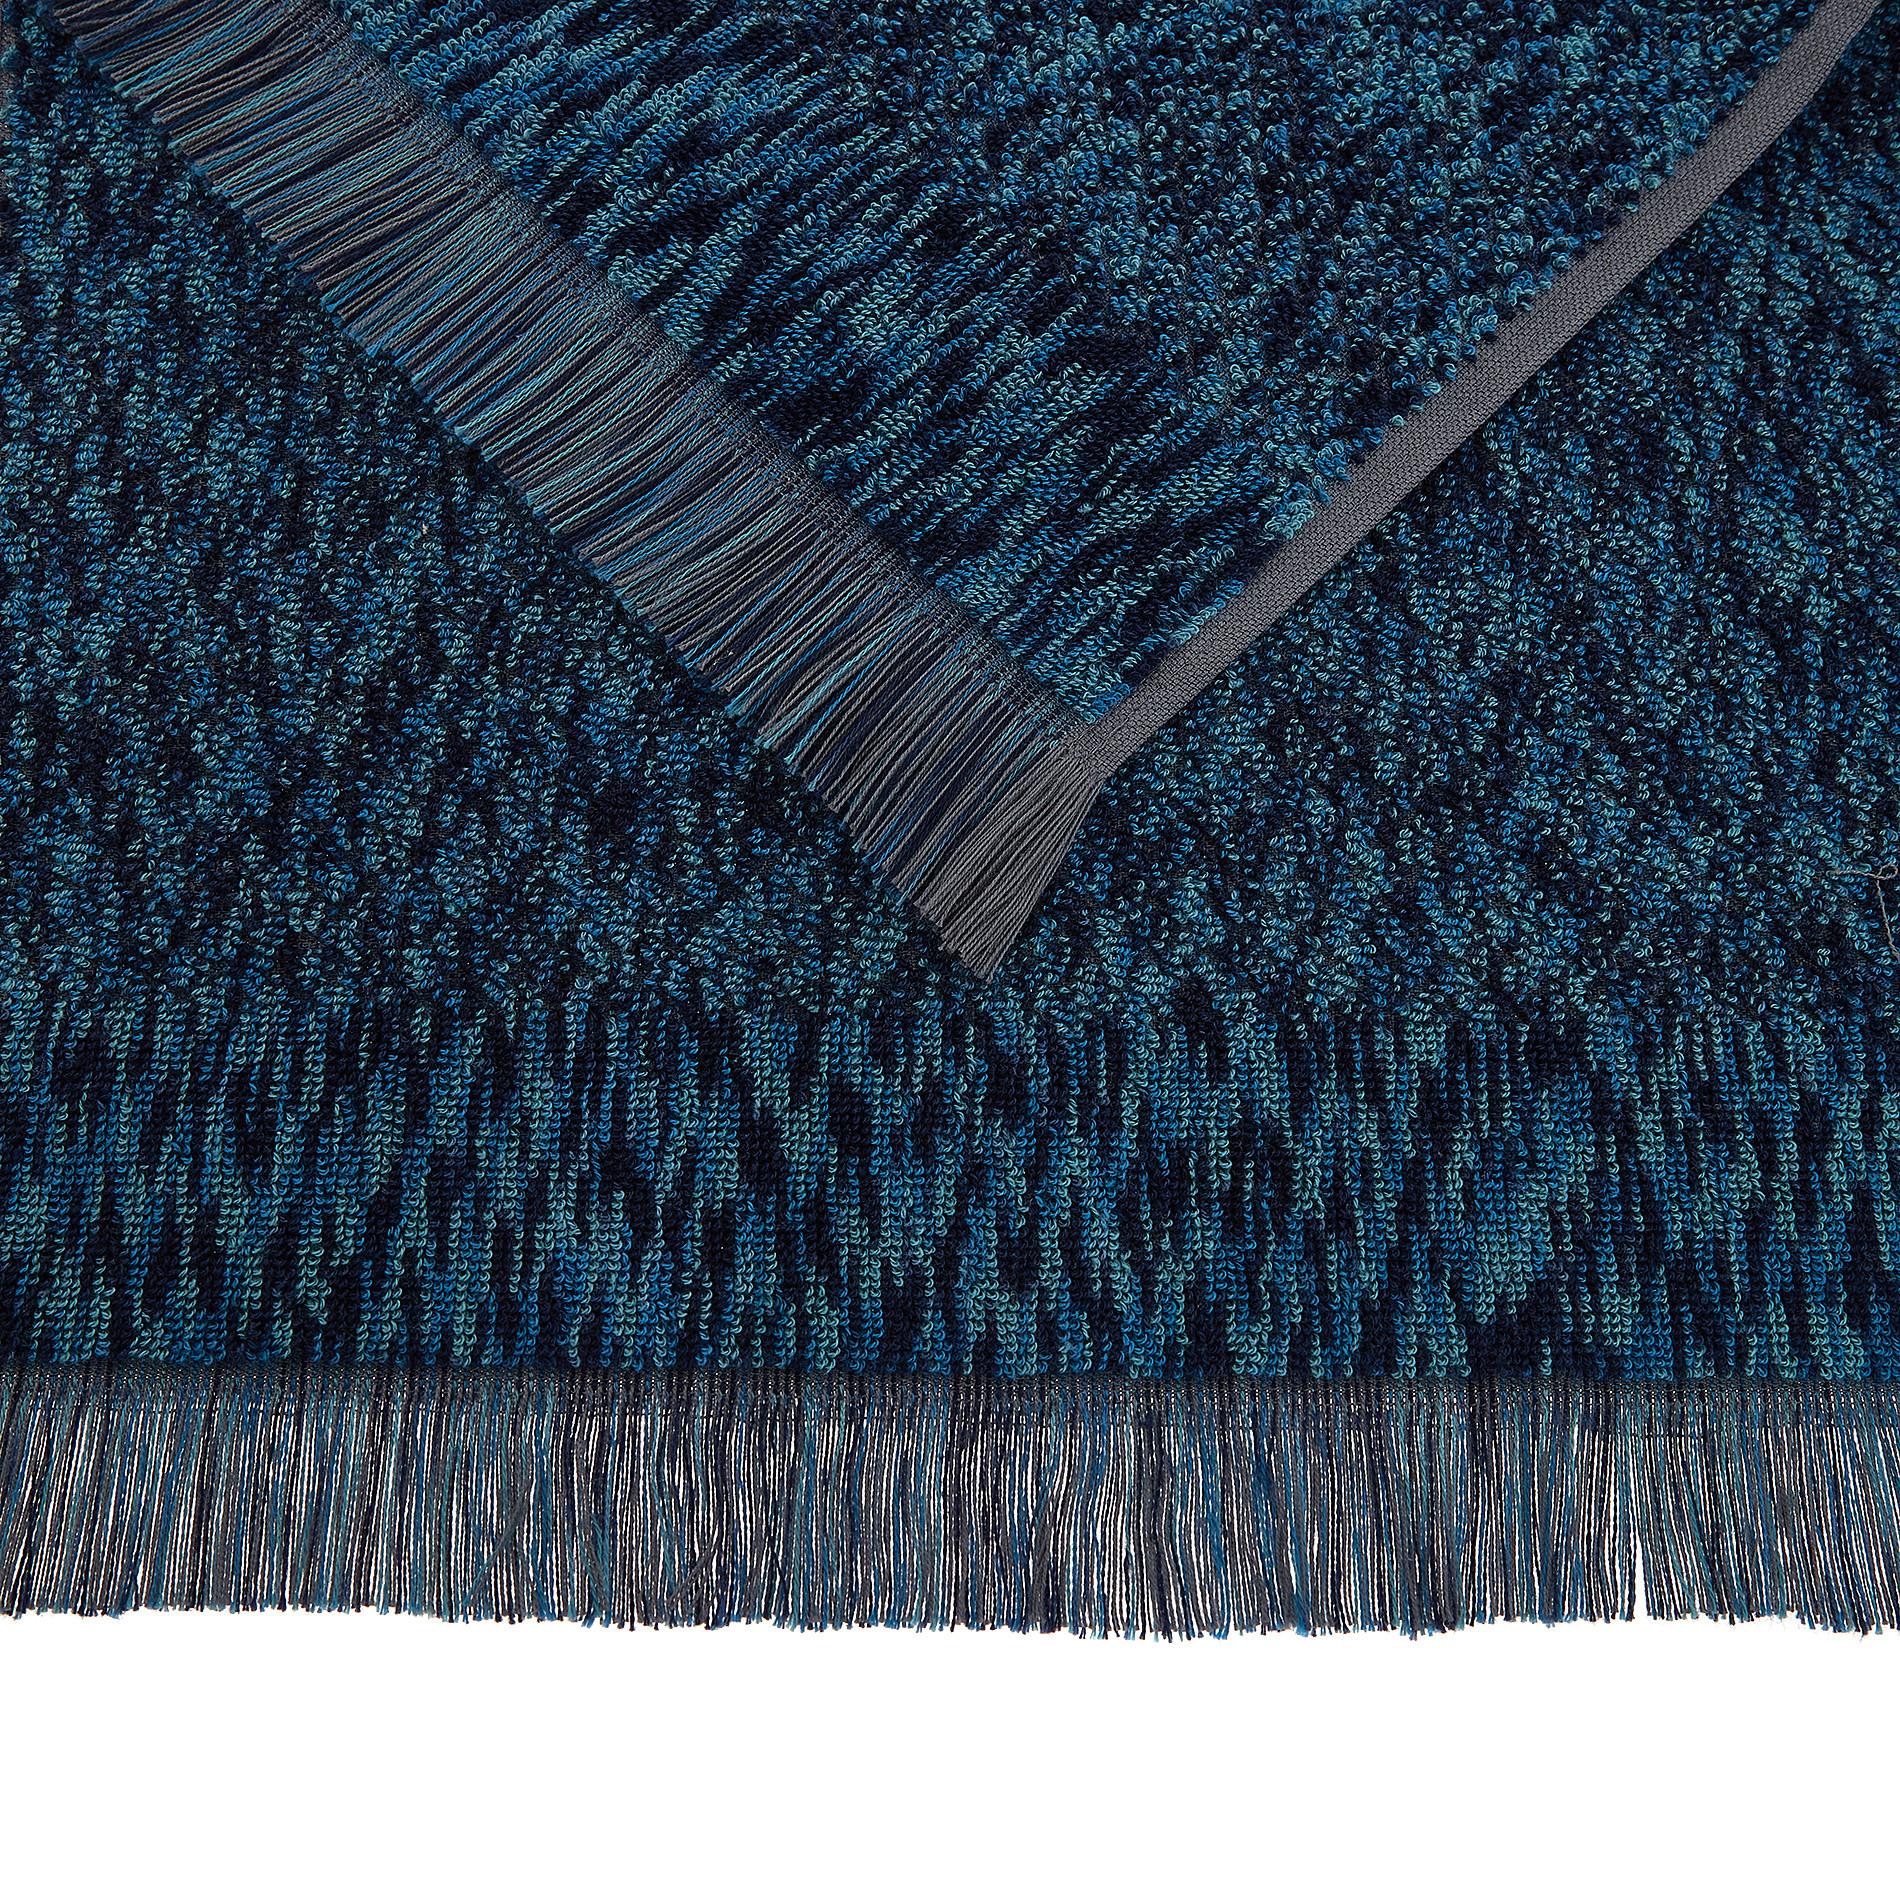 Asciugamano spugna di cotone effetto melange, Blu, large image number 2